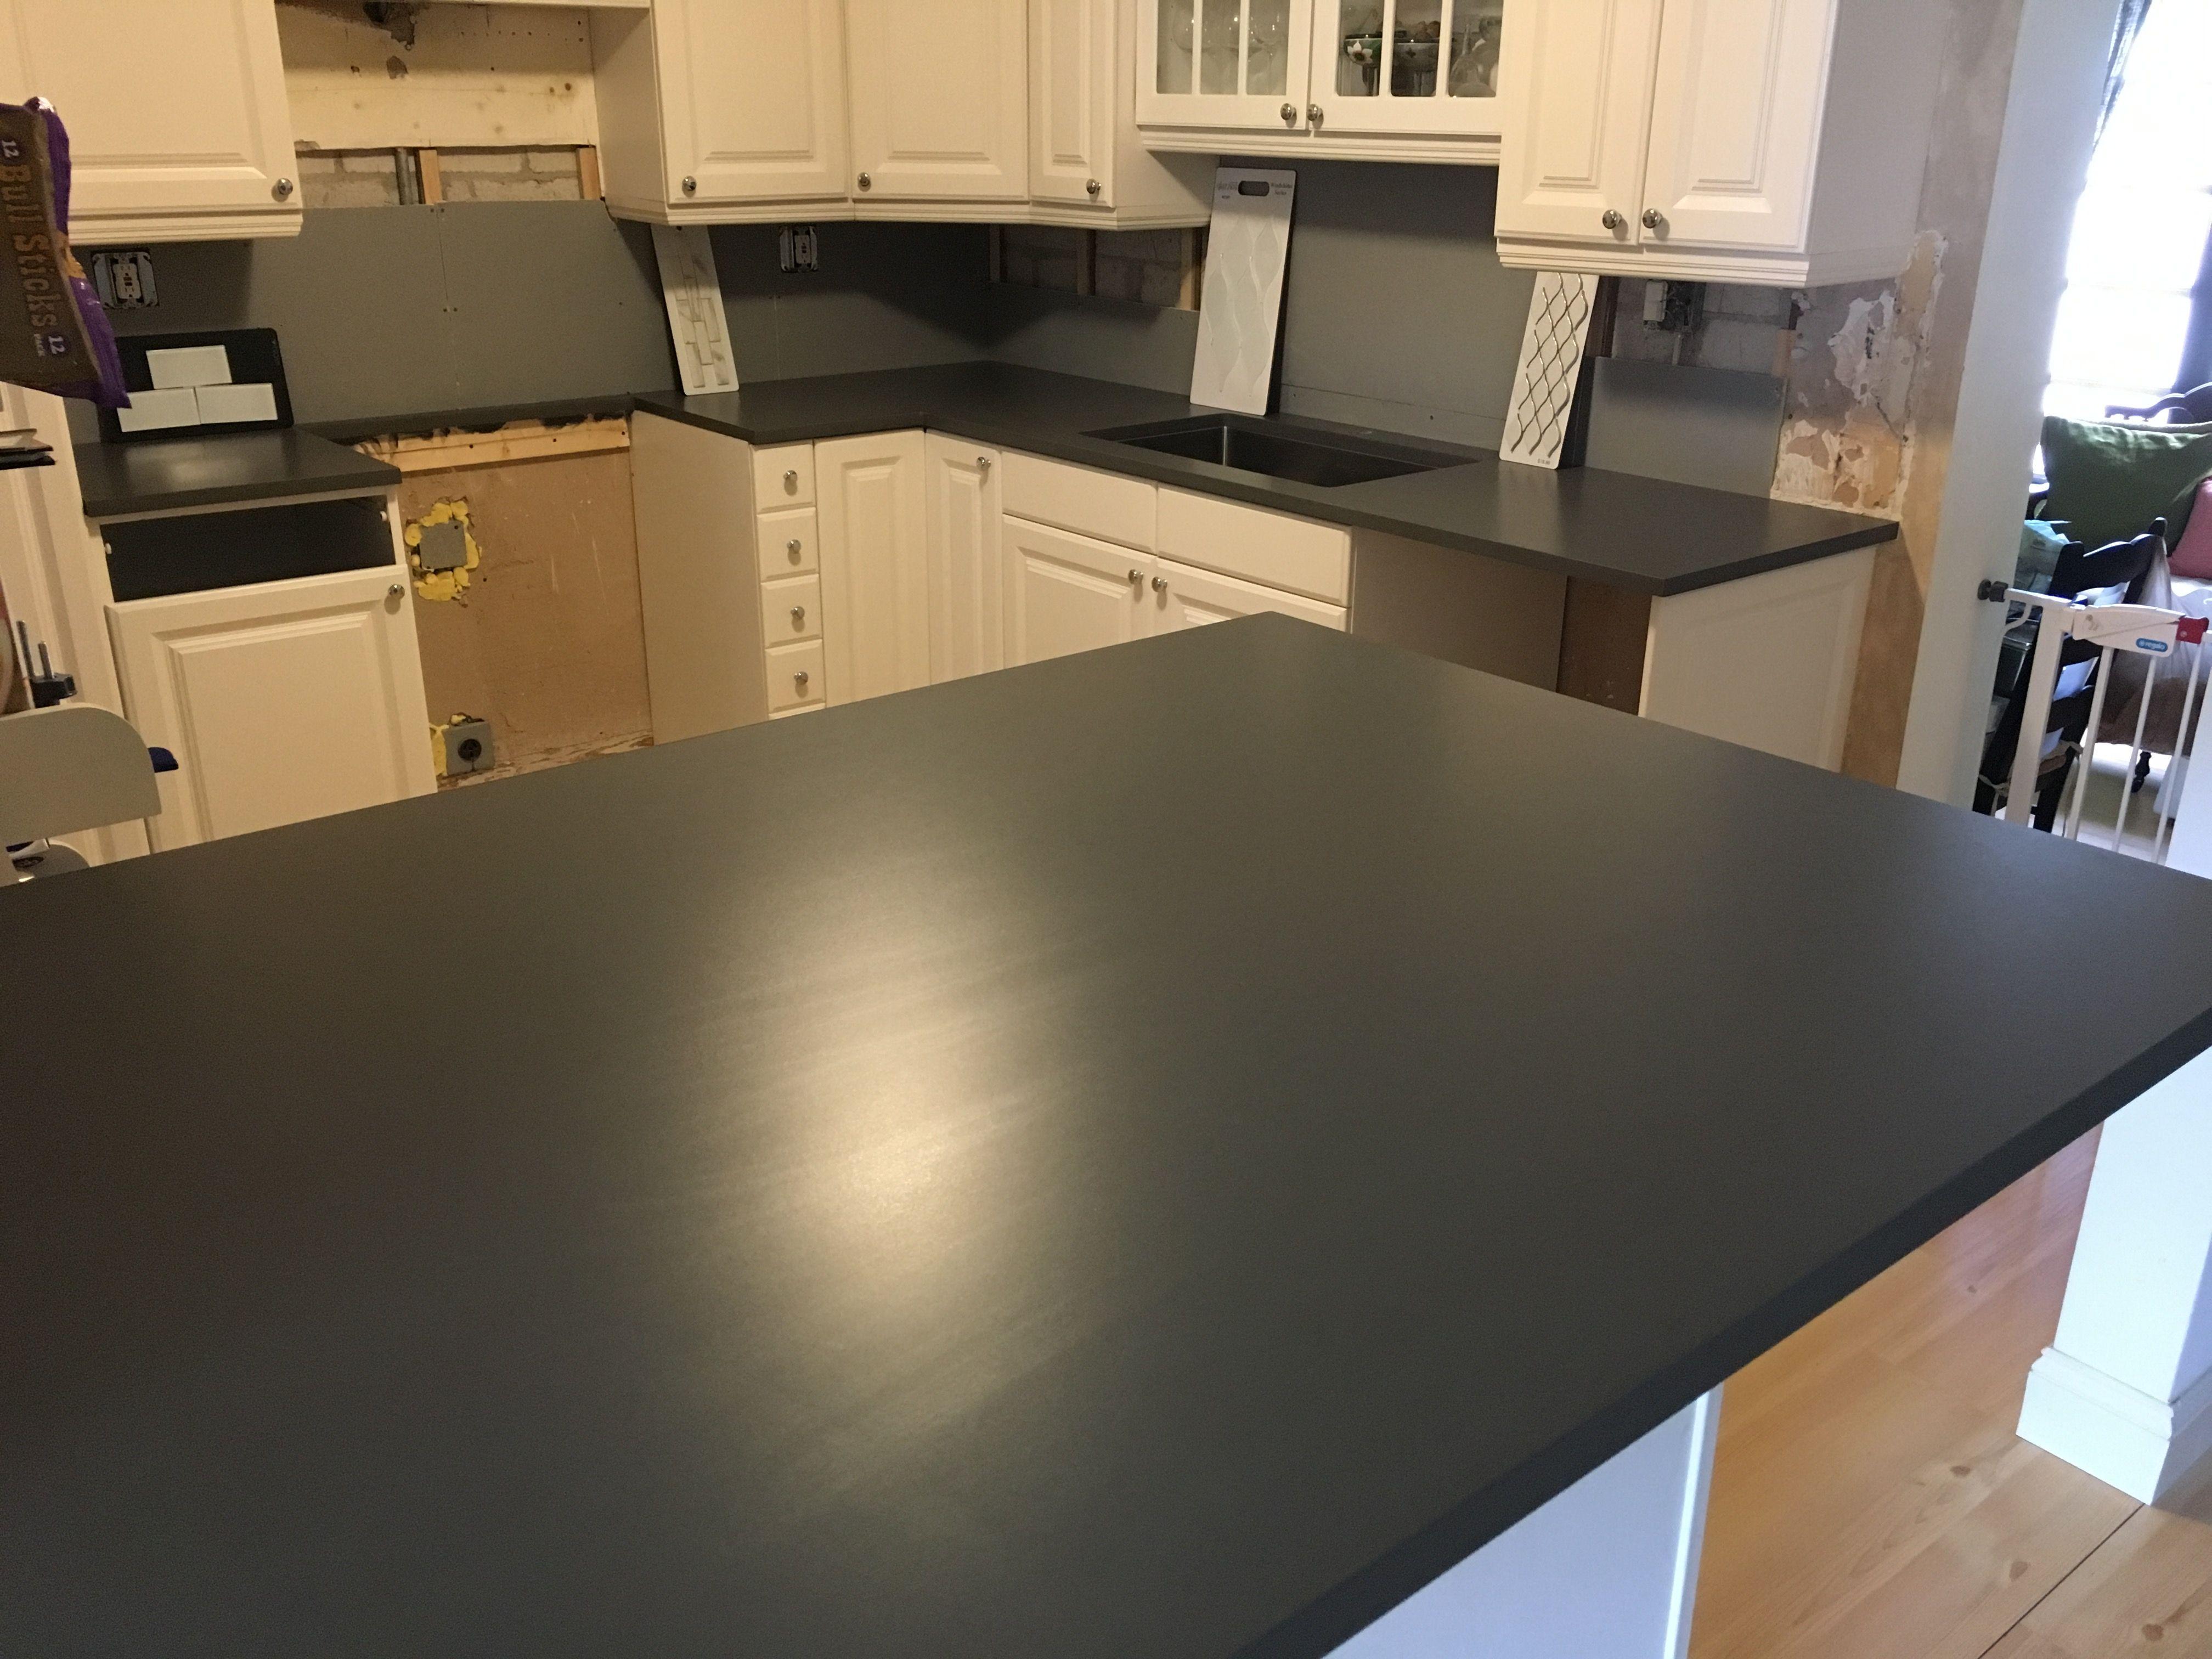 Silestone Quartz Cemento Spa 3cm Suede Finish In This Kitchen We